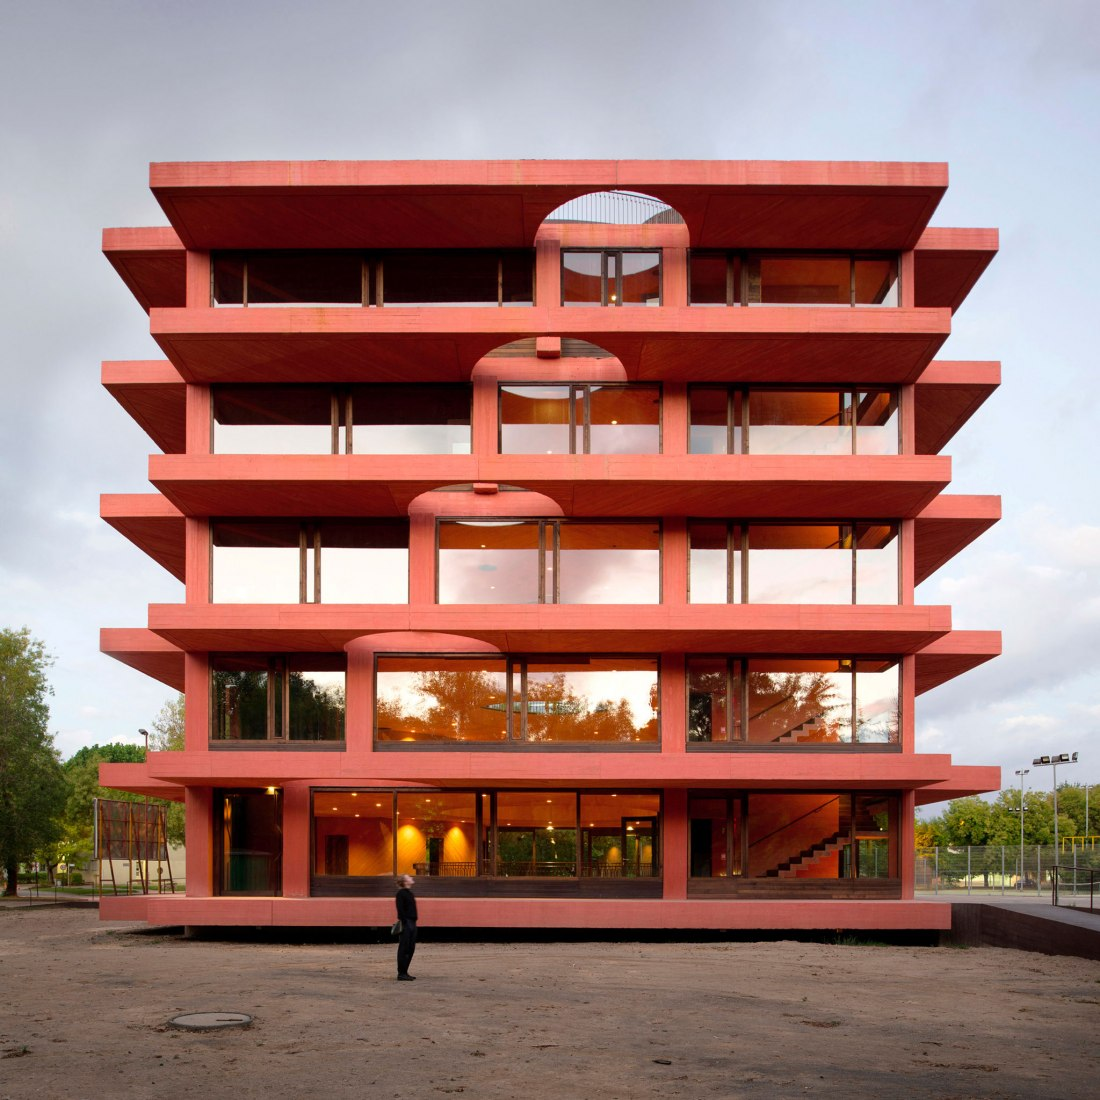 Centro de Innovación INES por Pezo von Ellrichshausen. Fotografía cortesía de Pezo von Ellrichshausen